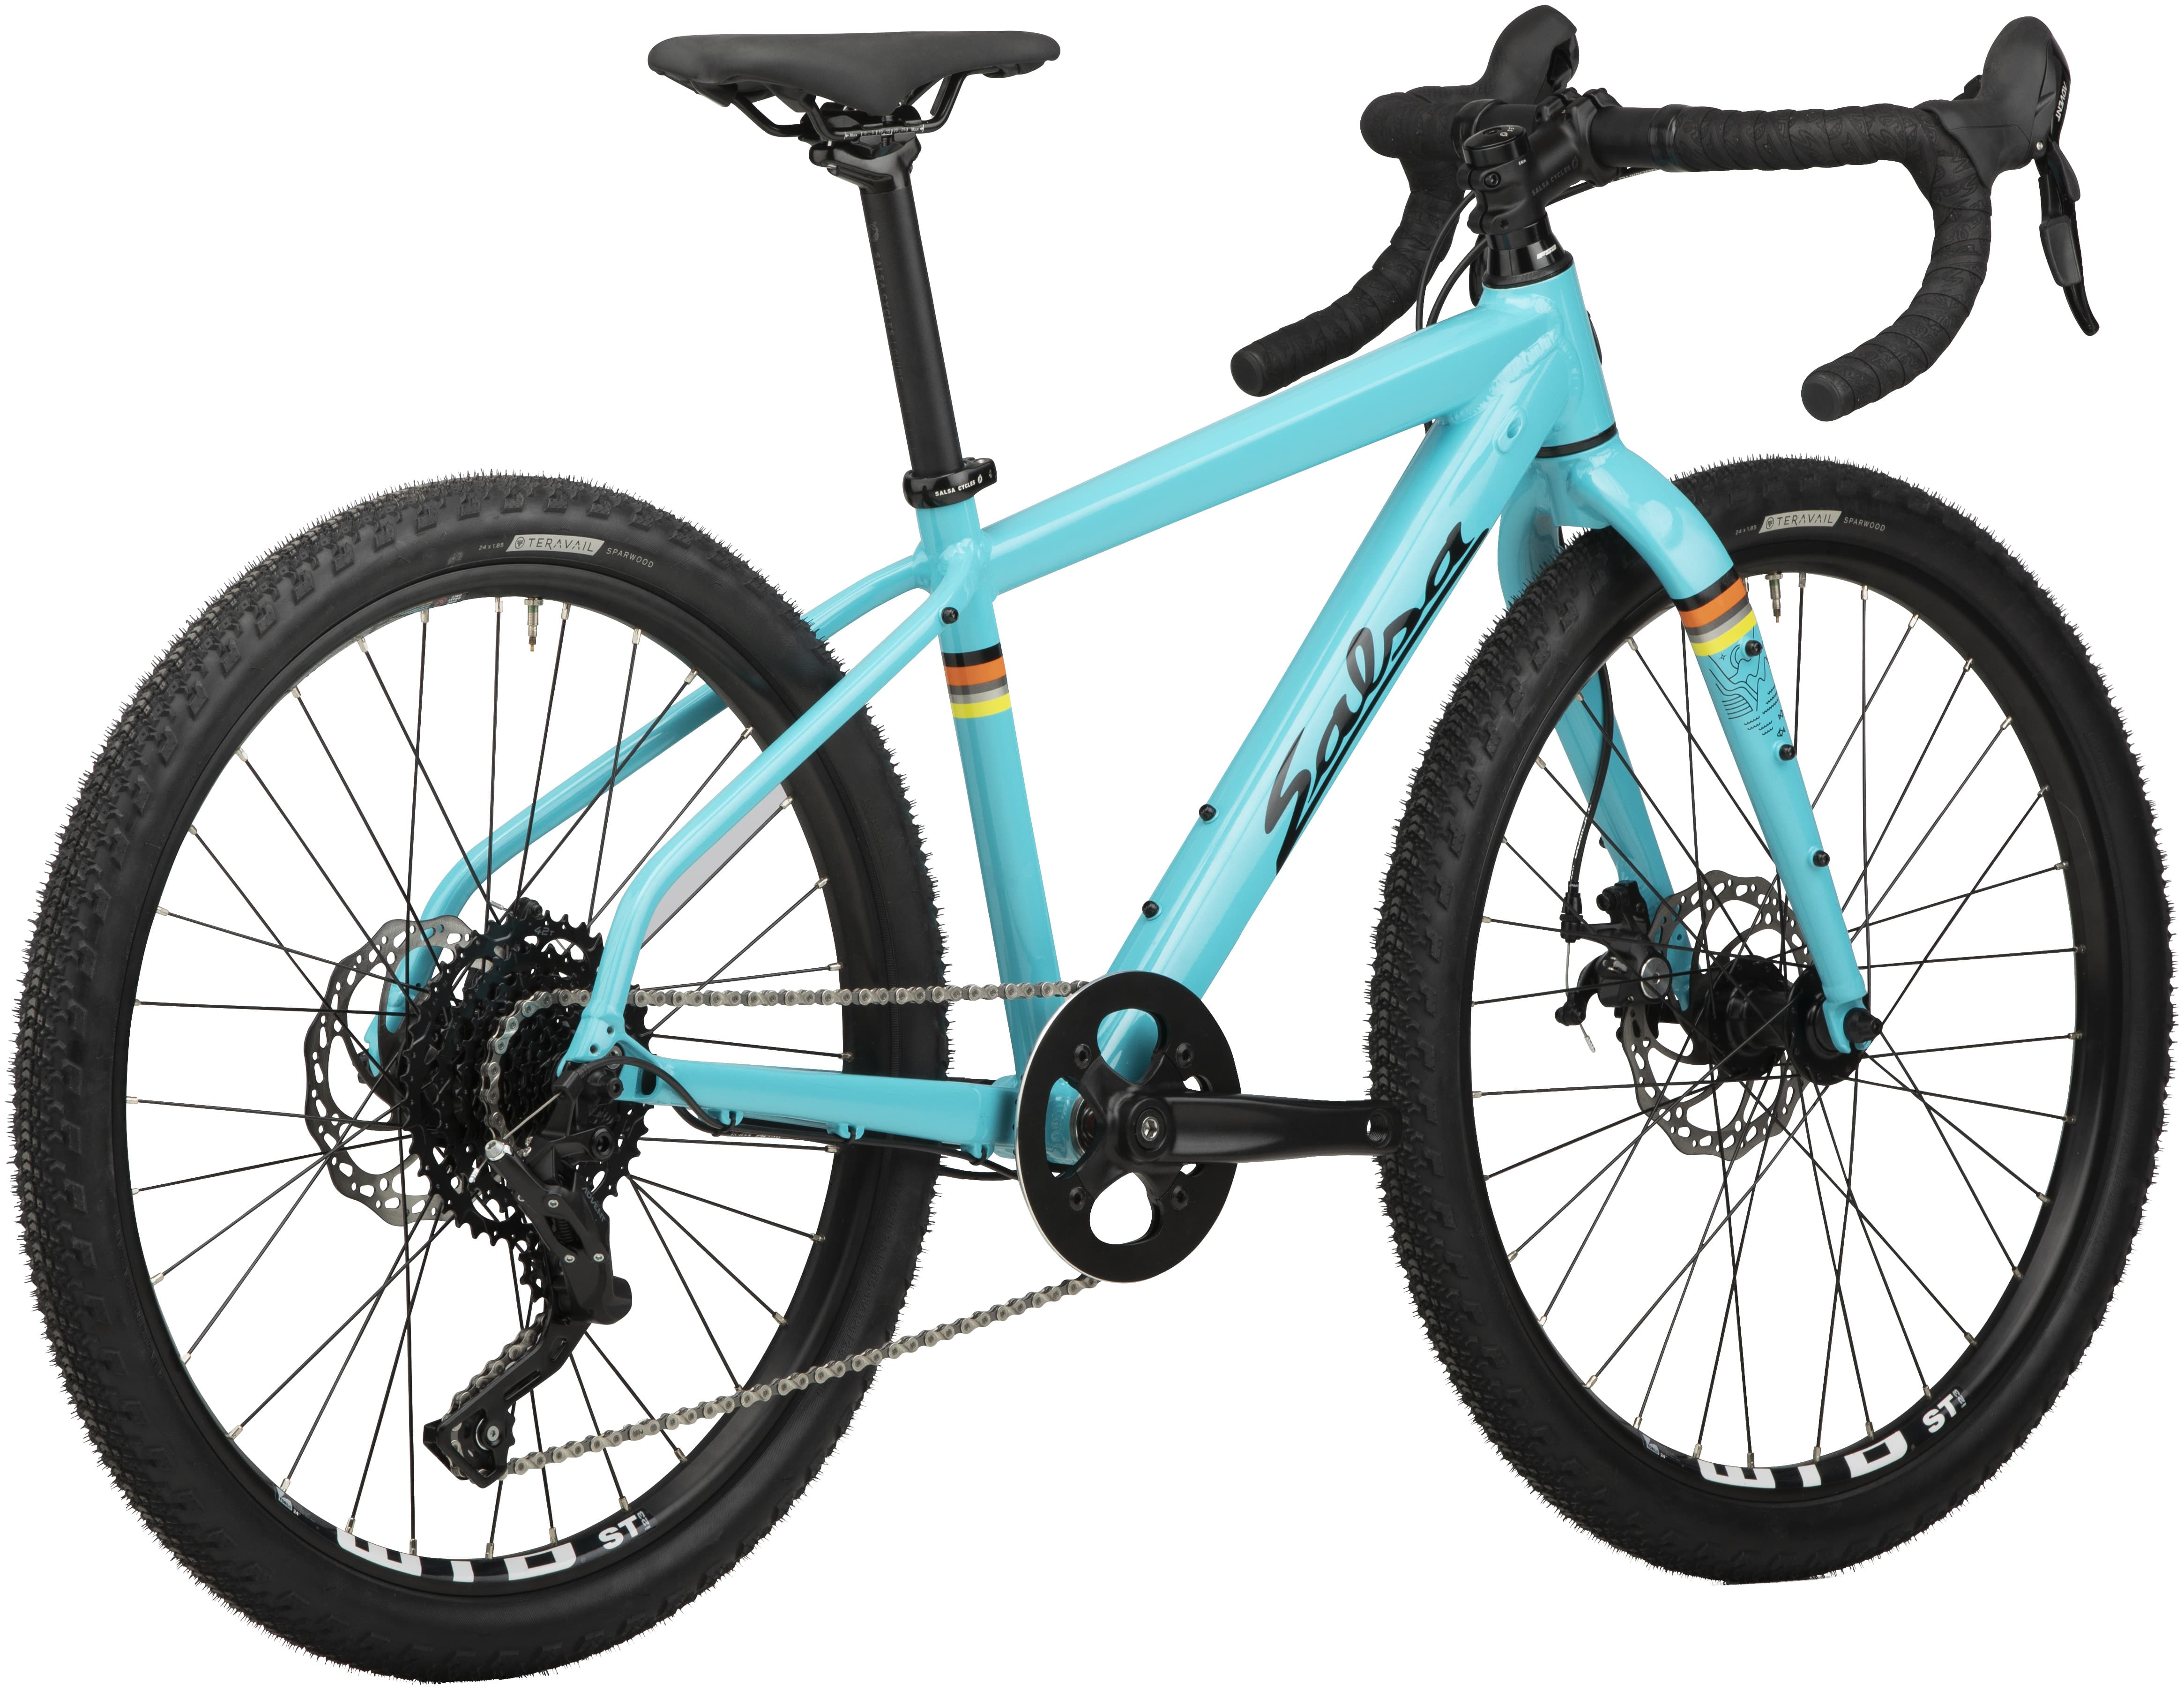 New Bike Day: Salsa Cycles New Journeyman 24 | Mountain Bike Action Magazine